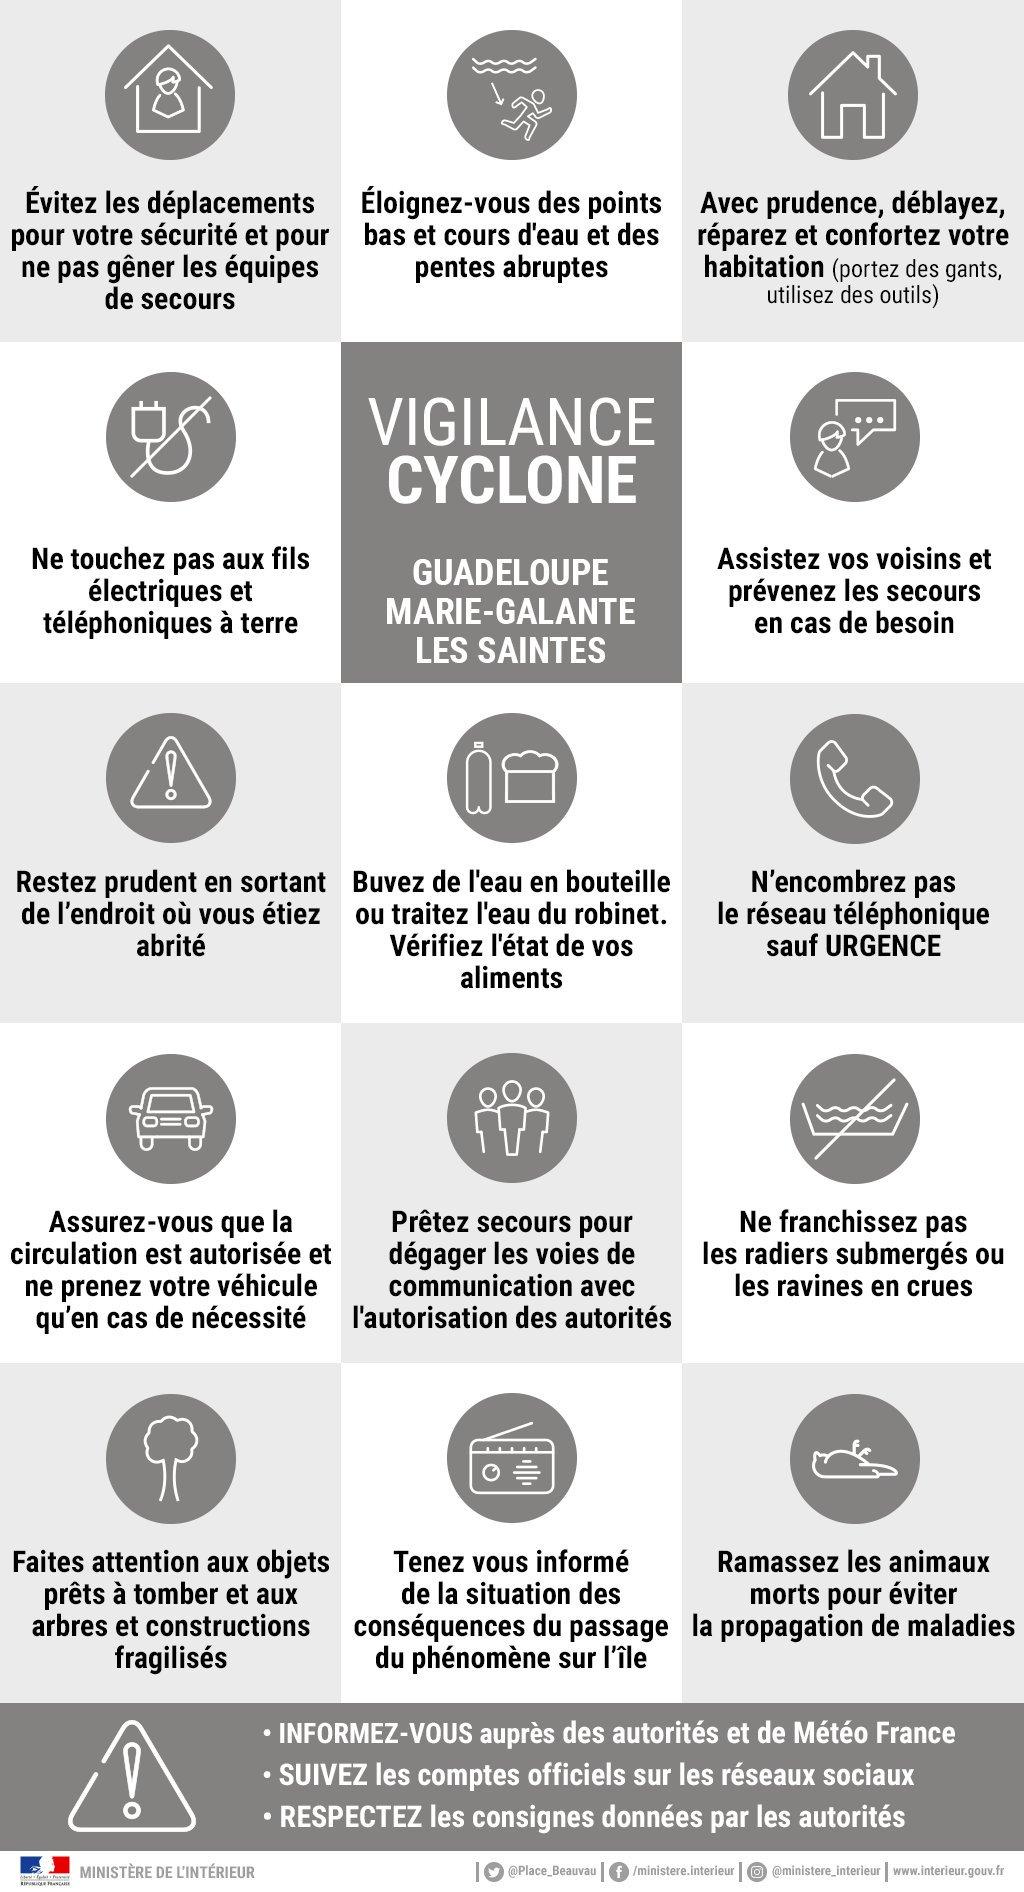 Saison cyclone 2017 - Page 2 DKFeQ49W0AEWrH-